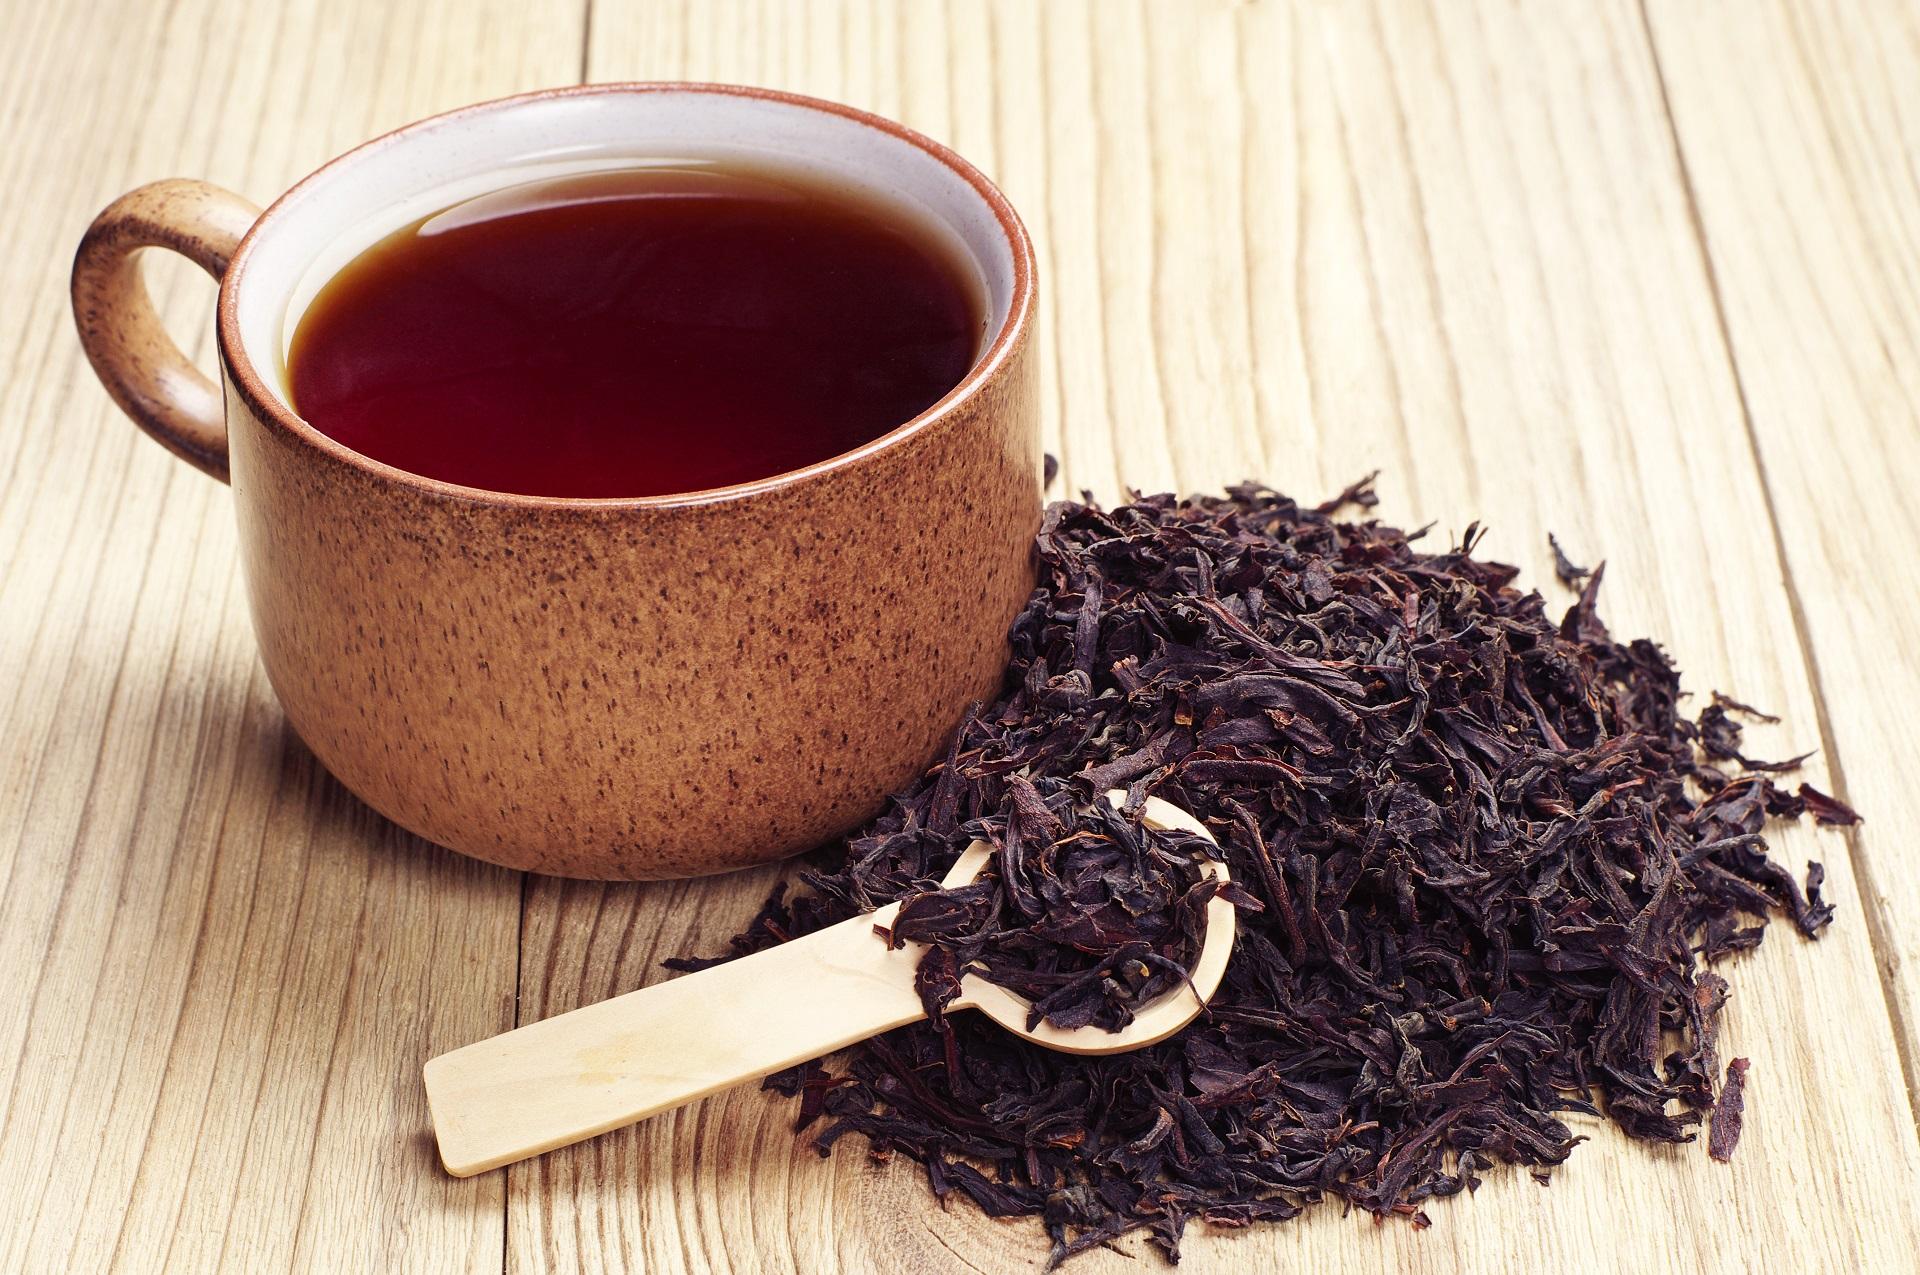 Gravitas -dark tea was produced accidentally, on the Silk Road